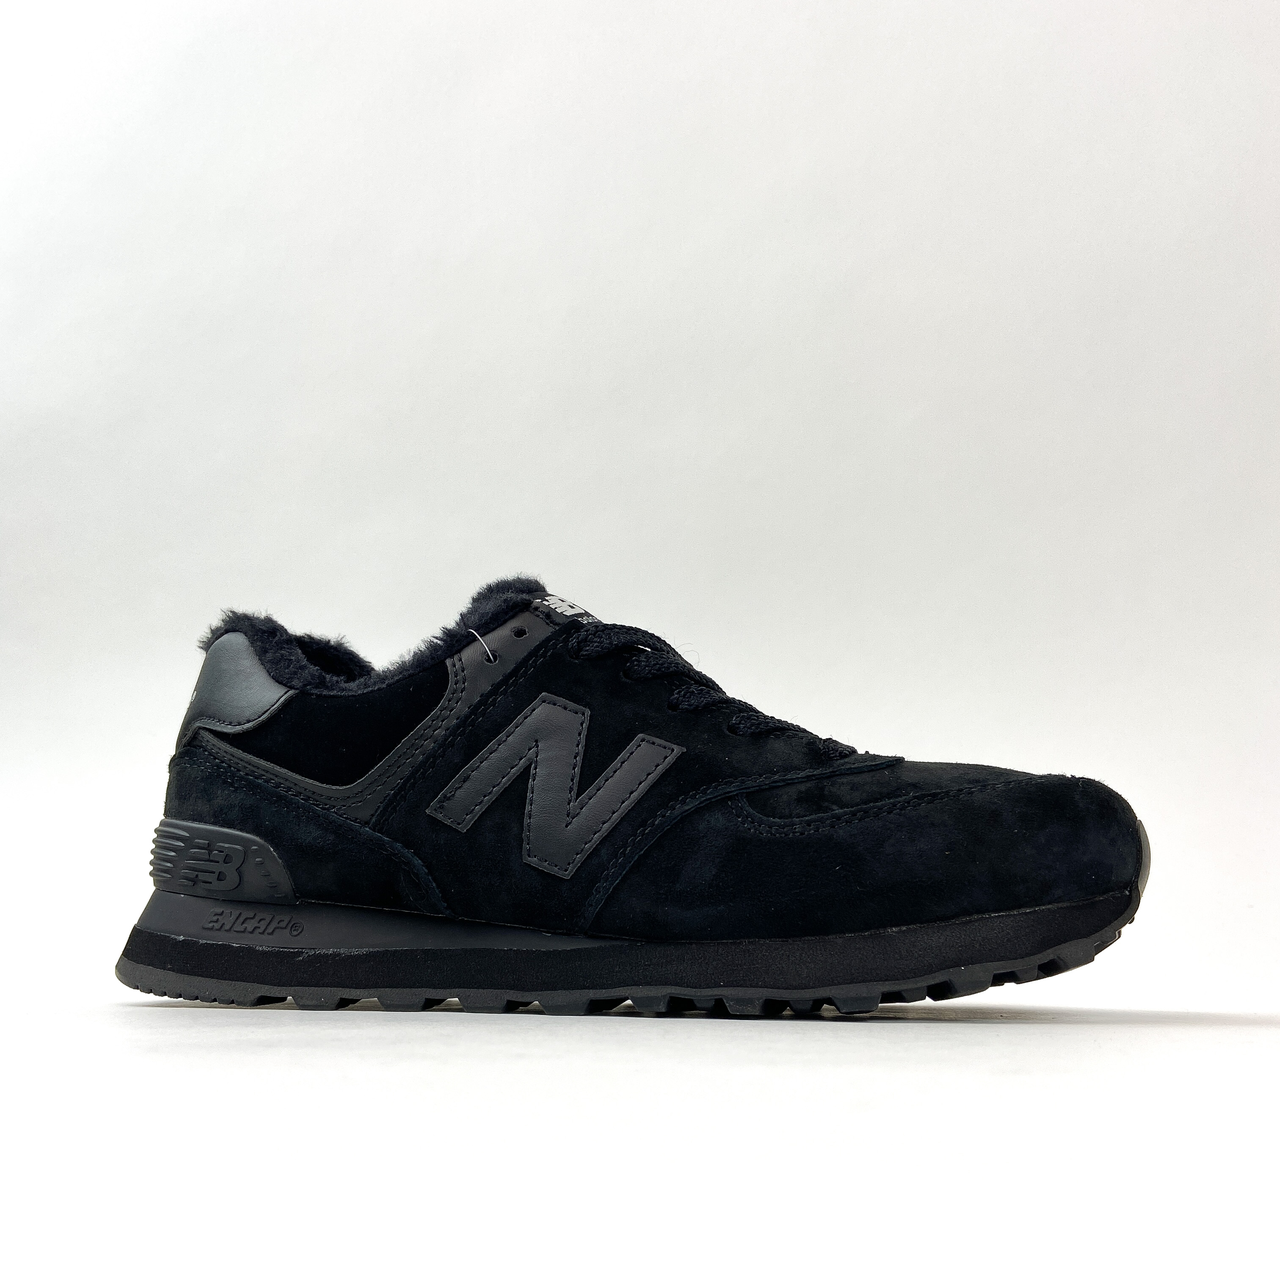 New Balance 574 Triple Black (Мех) (Черный)